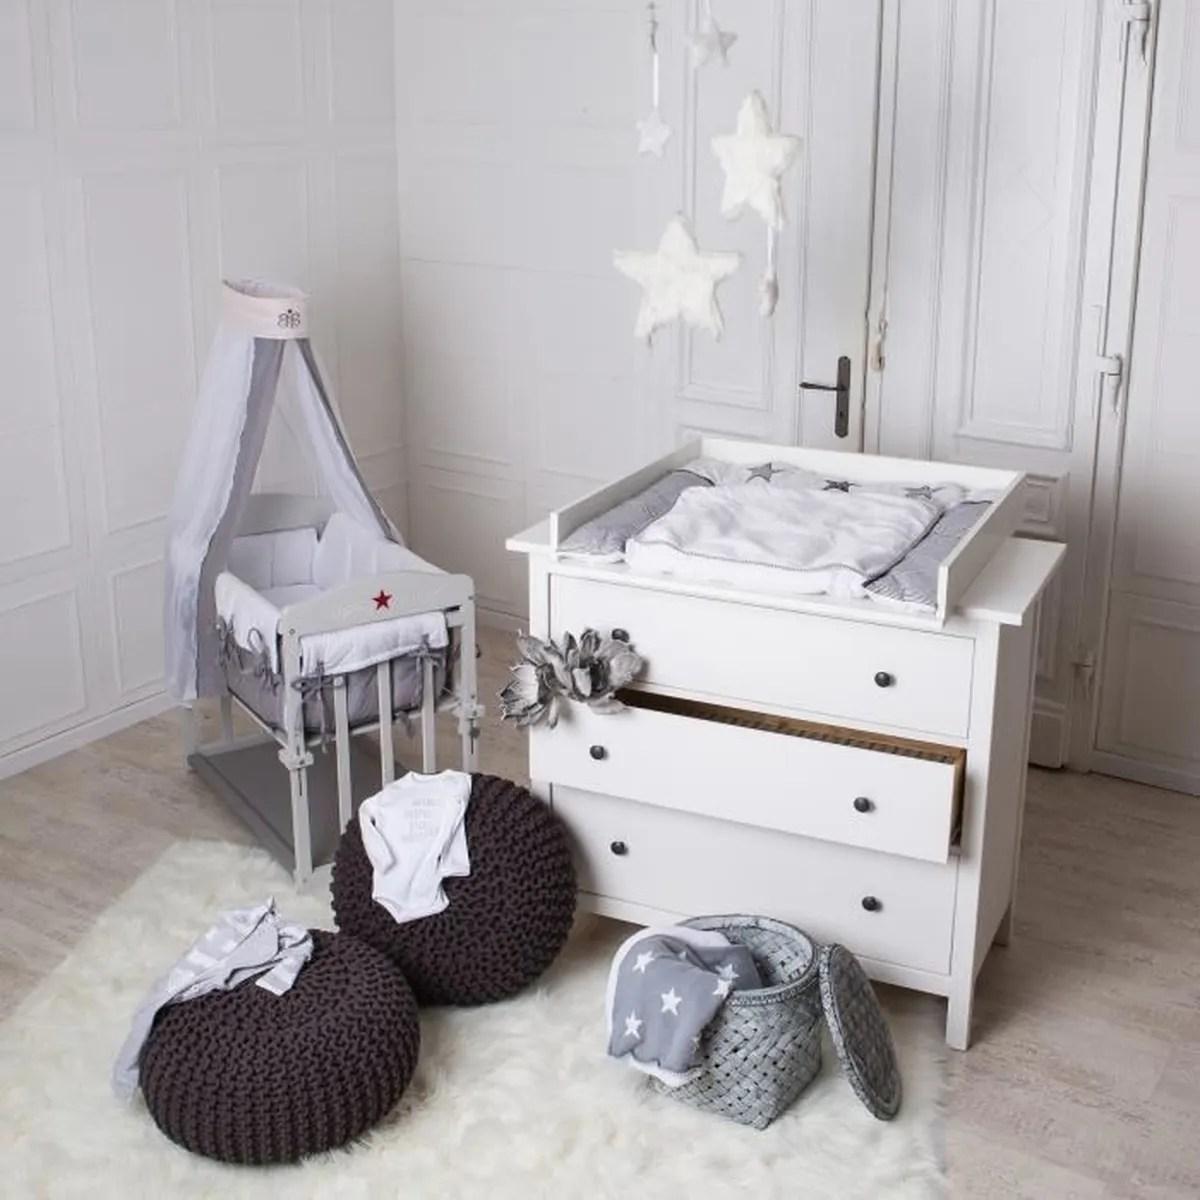 Plan à Langer Top Pour Ikea Birkeland Tyssedal Herefoss